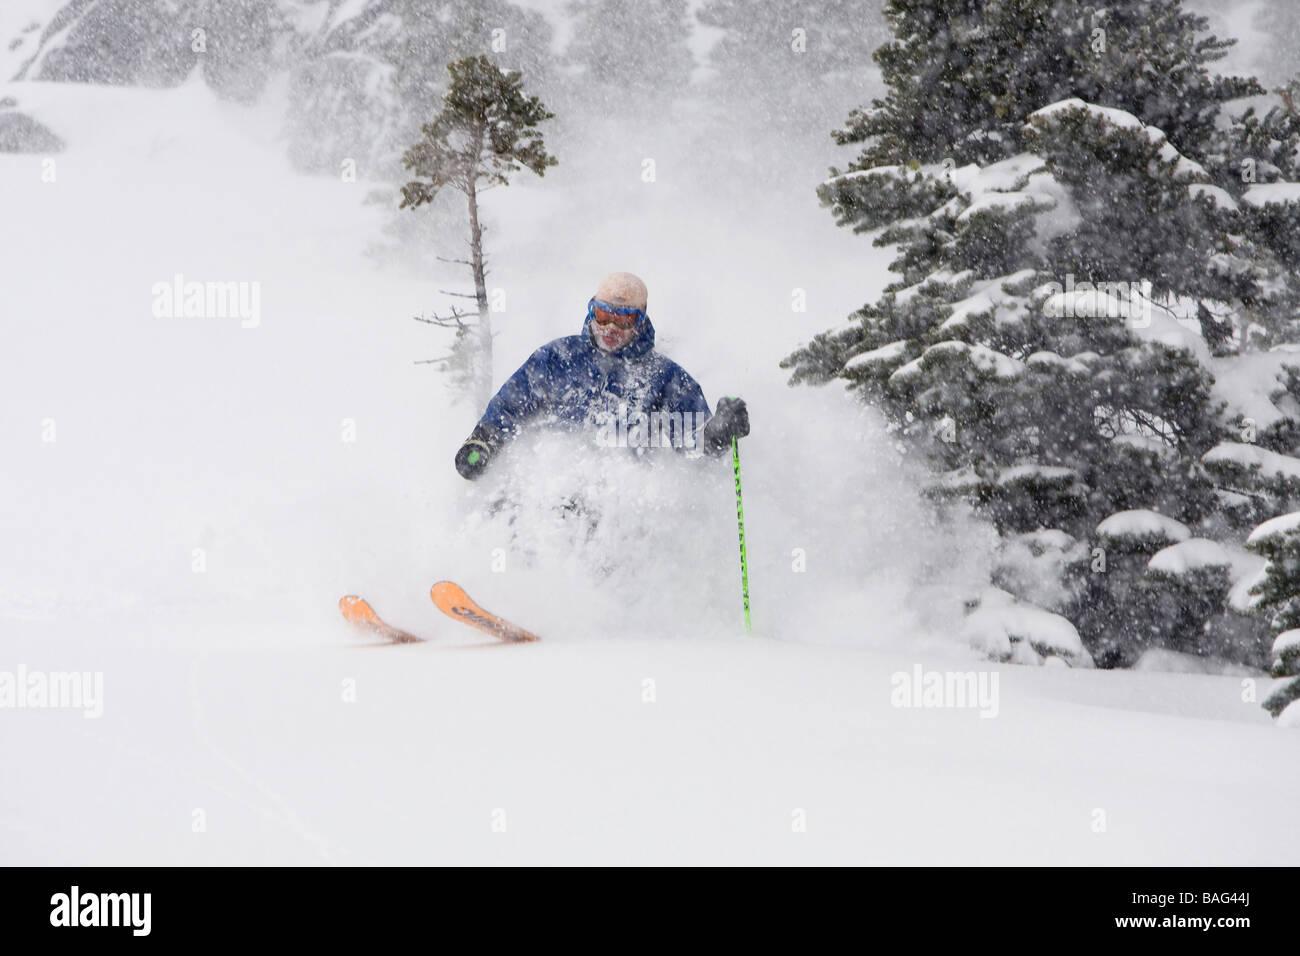 canada canadian provinces north america photography Randy Lincks Whistler British Columbia bc ski skiing recreation - Stock Image